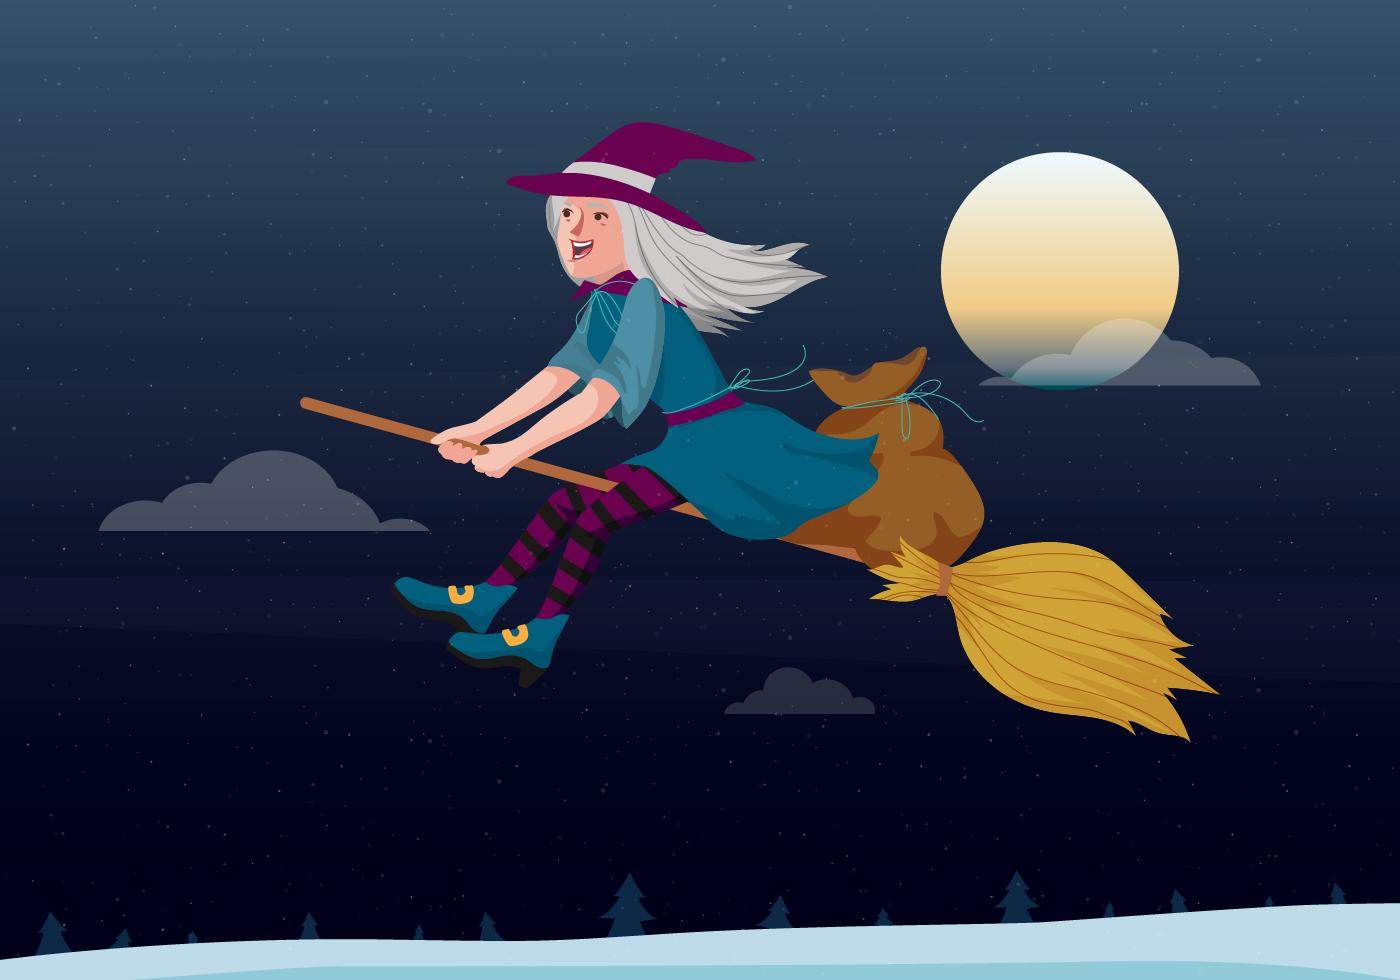 Befana Flying On A Broomstick Vector Illustration